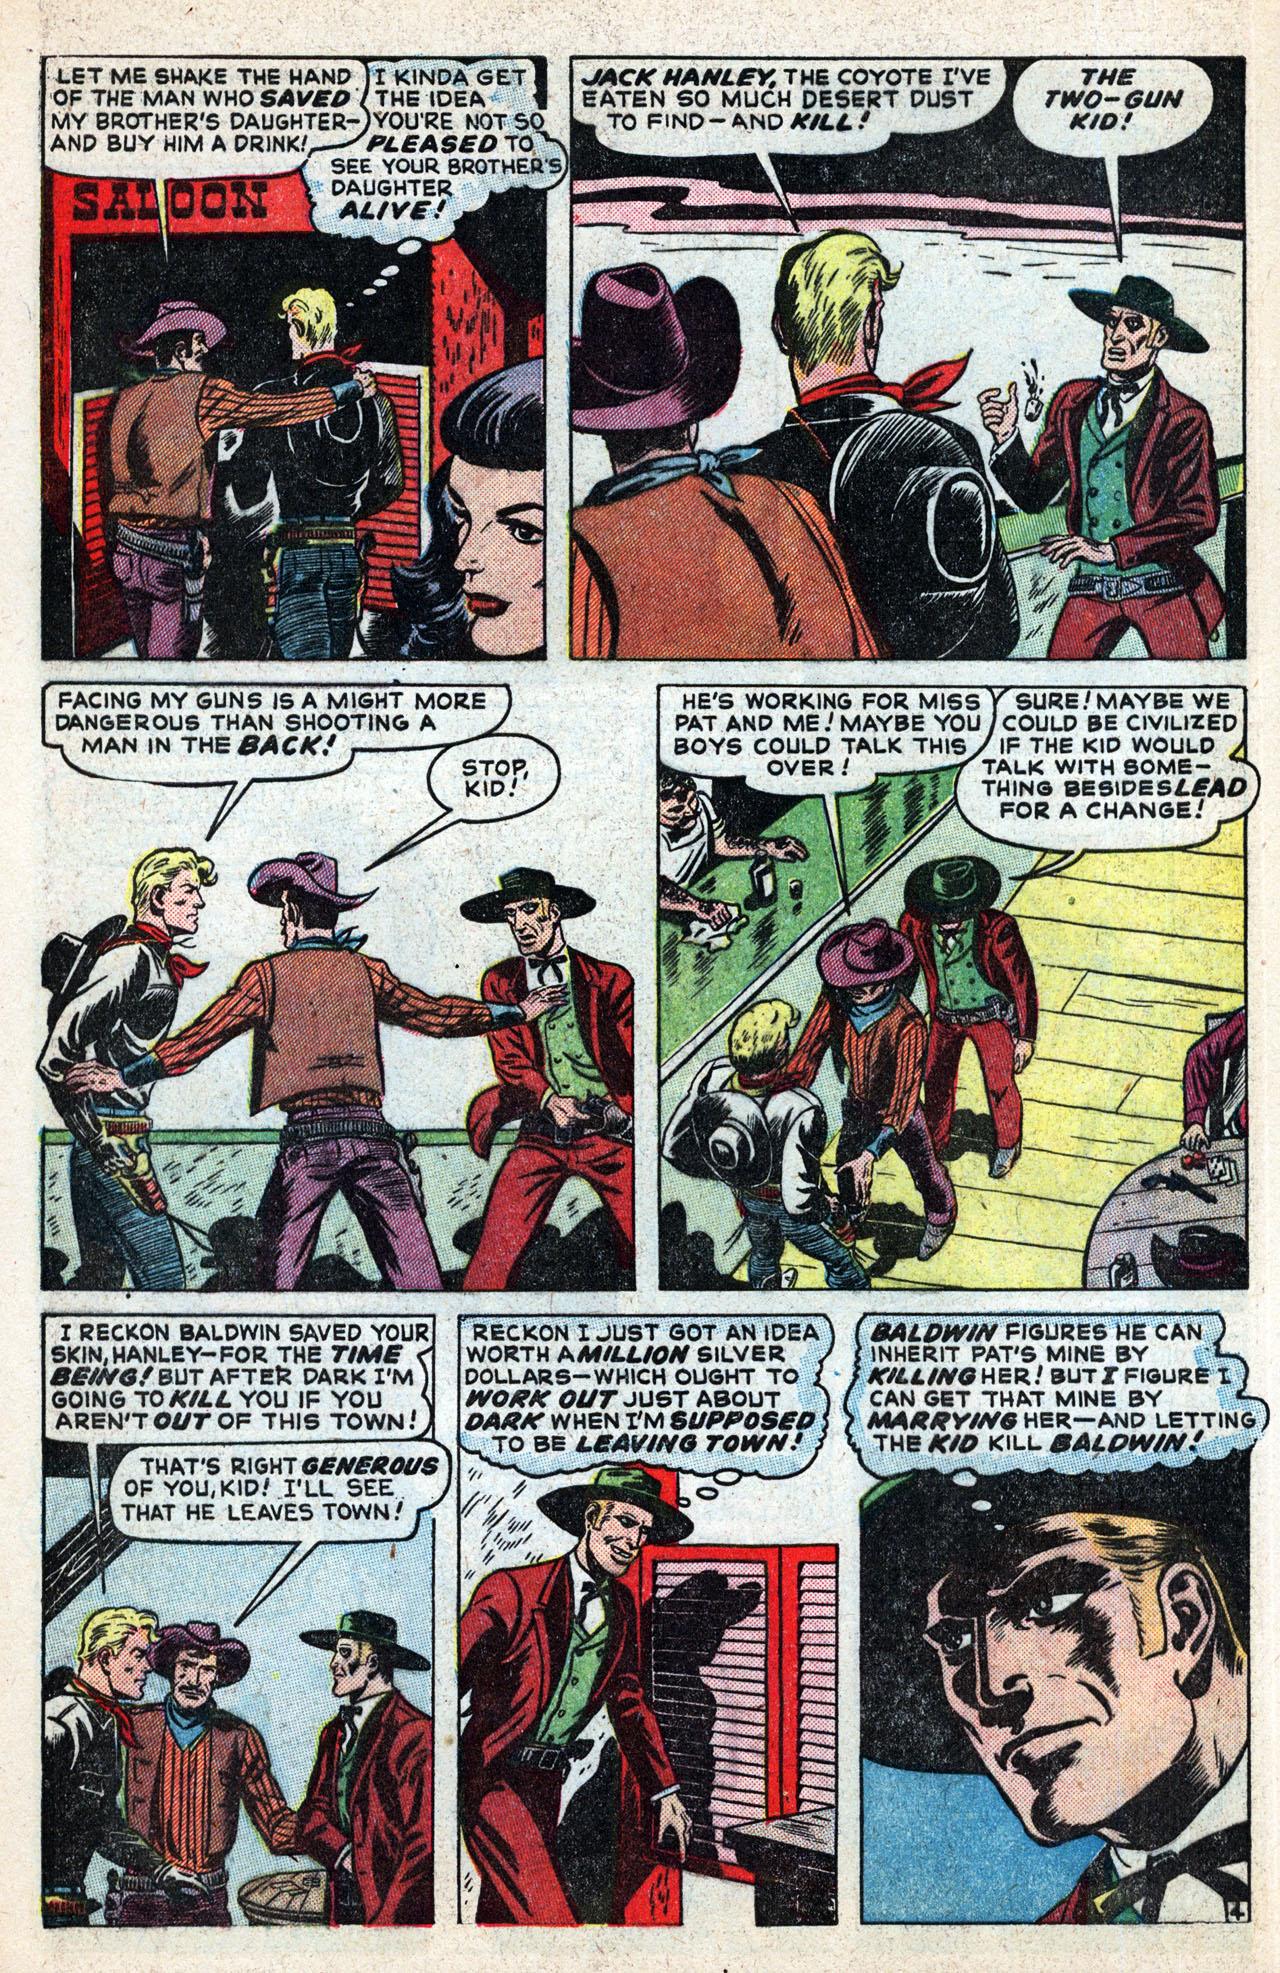 Read online Two-Gun Kid comic -  Issue #4 - 46